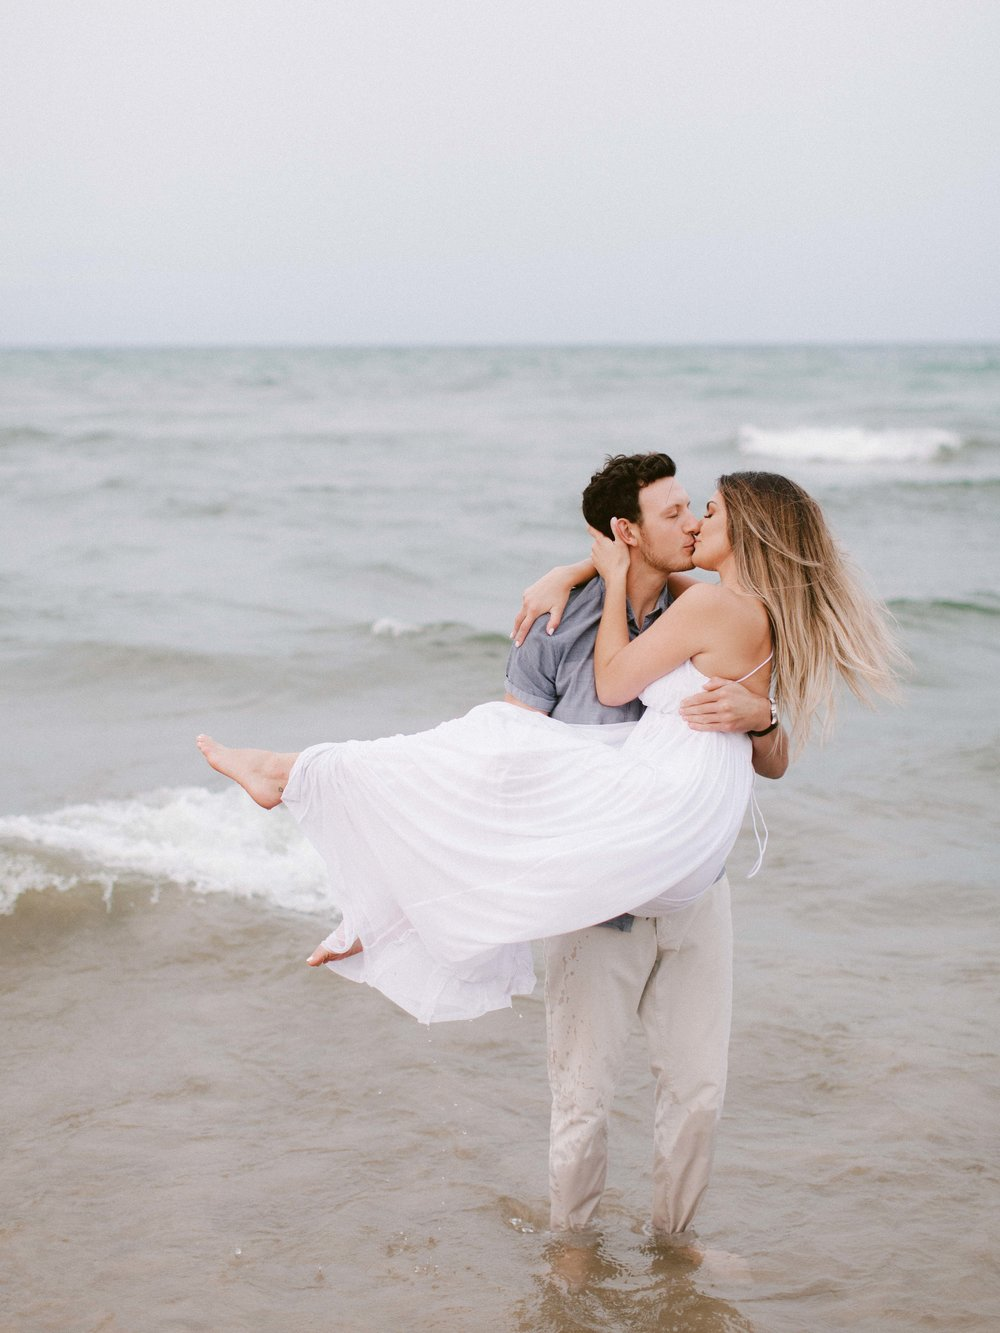 Summer_Engagament_Session_Toronto_Niagara_Wedding_Photographer (61 of 67).jpg